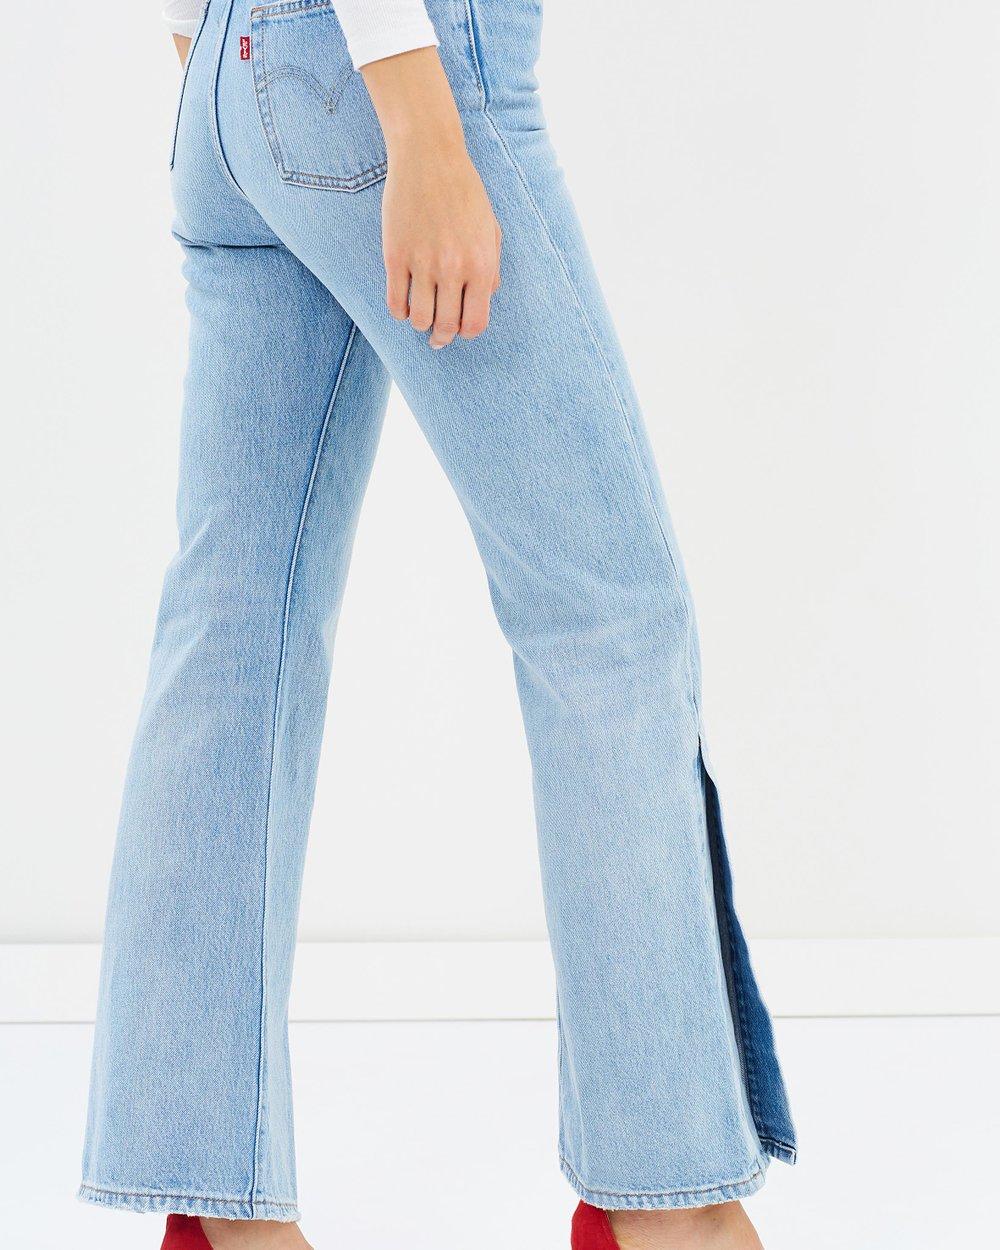 1f2f500c0c0878 Ribcage Split Flare Jeans by Levi's Online | THE ICONIC | Australia